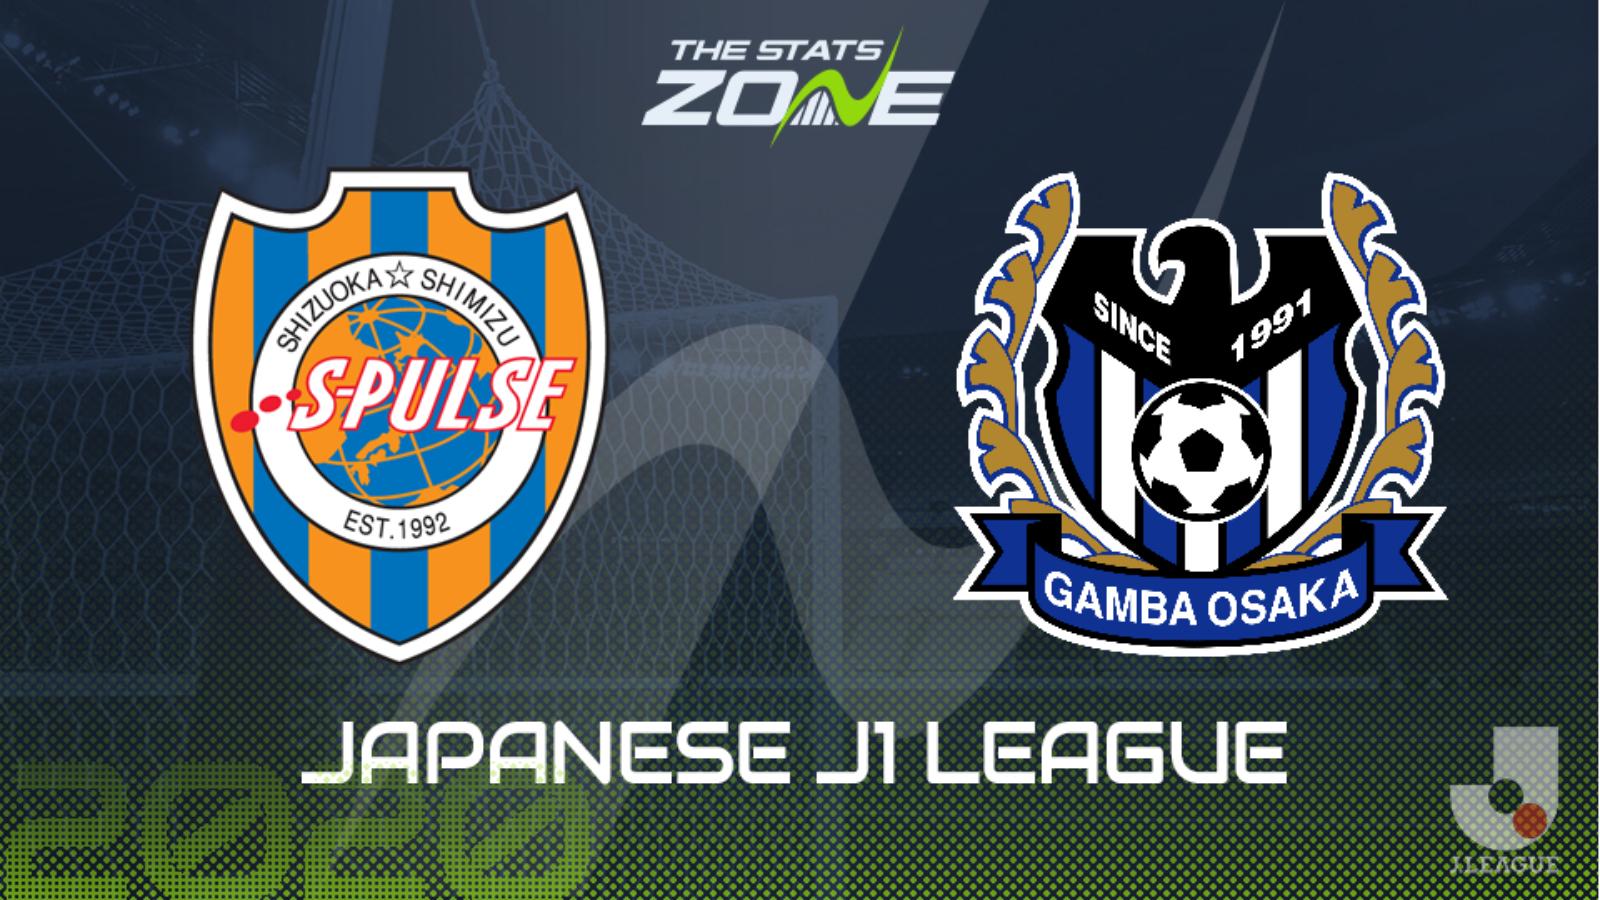 2019 20 Japanese J1 League Shimizu S Pulse Vs Gamba Osaka Preview Prediction The Stats Zone